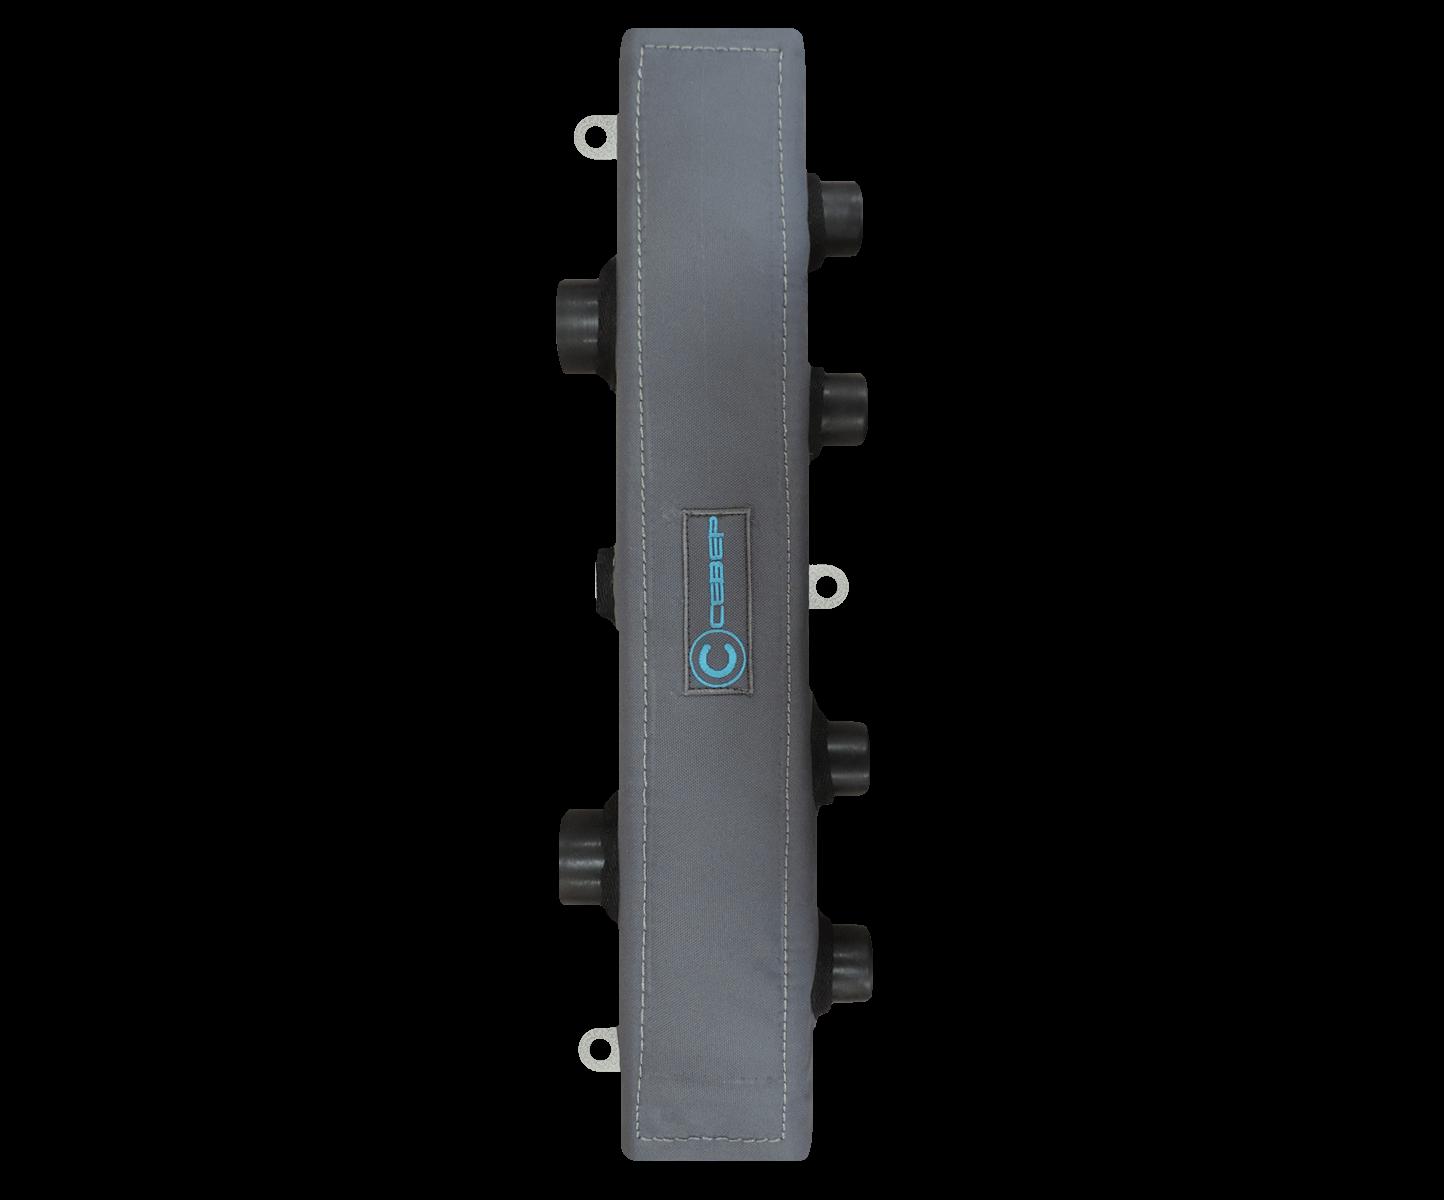 Теплоизоляция, теплоизоляционный чехол для гидрообвязки Север 60К2